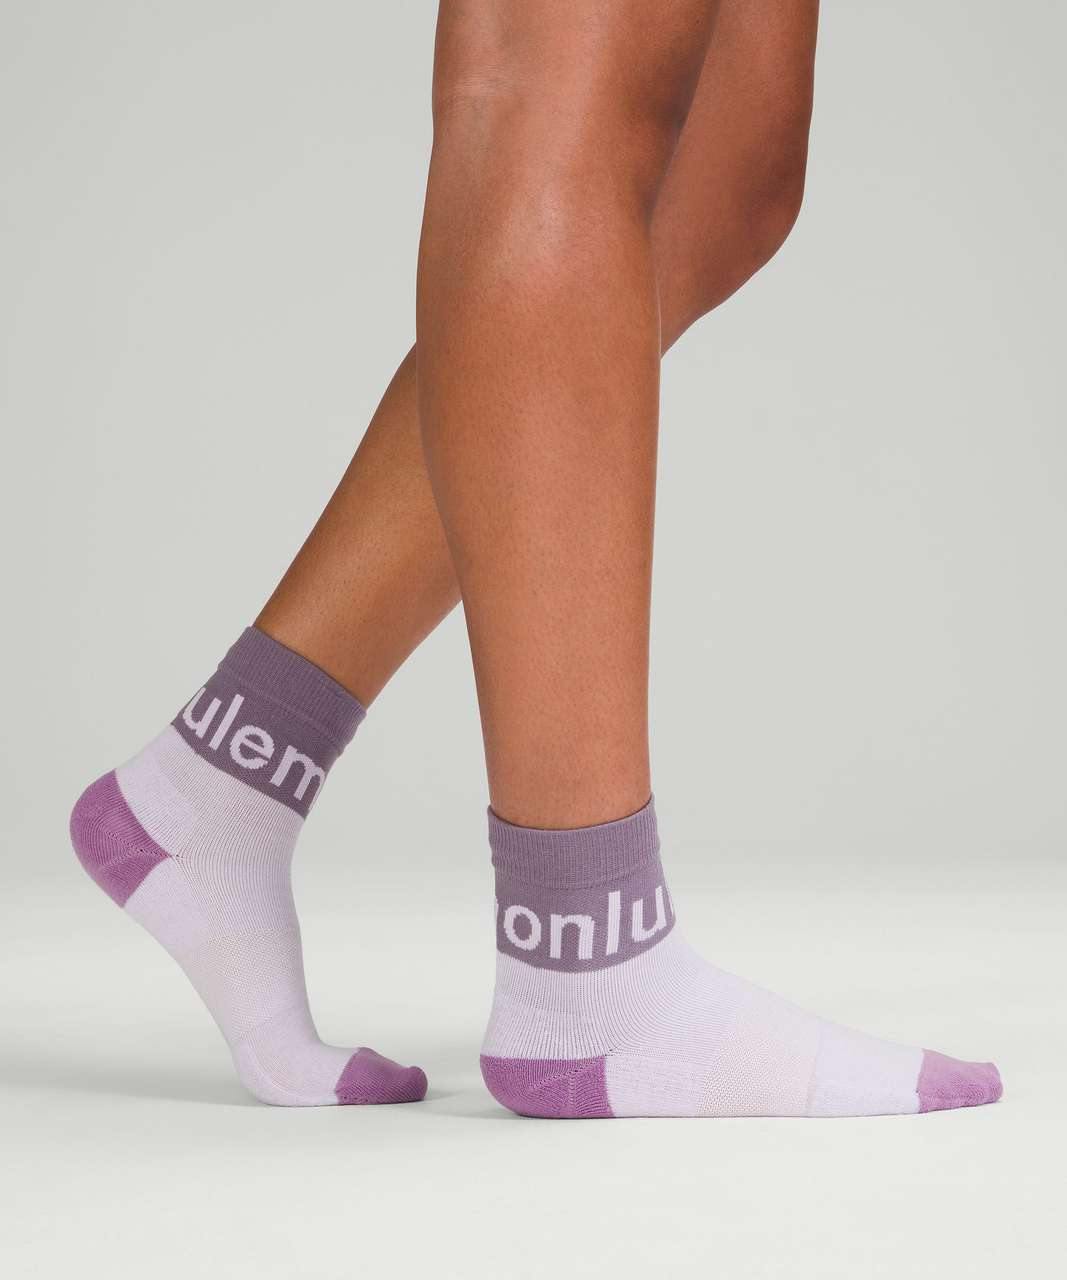 Lululemon Daily Stride Mid-Crew Sock - Dusky Lavender